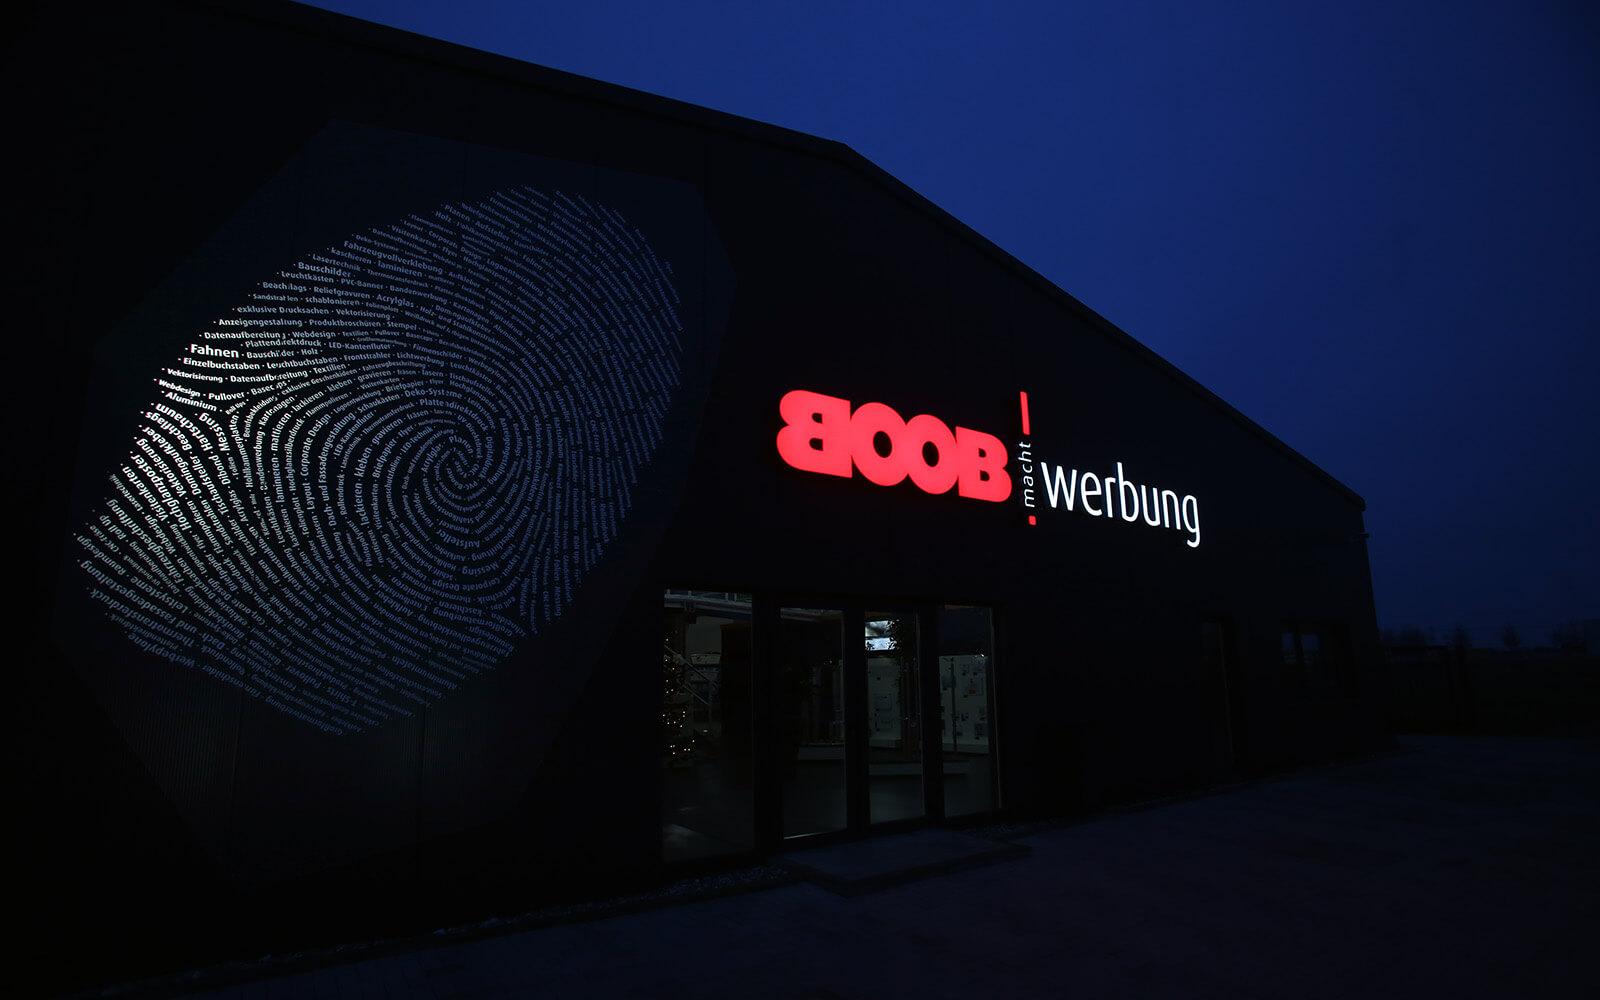 BOOB Werbung Werbetechniker